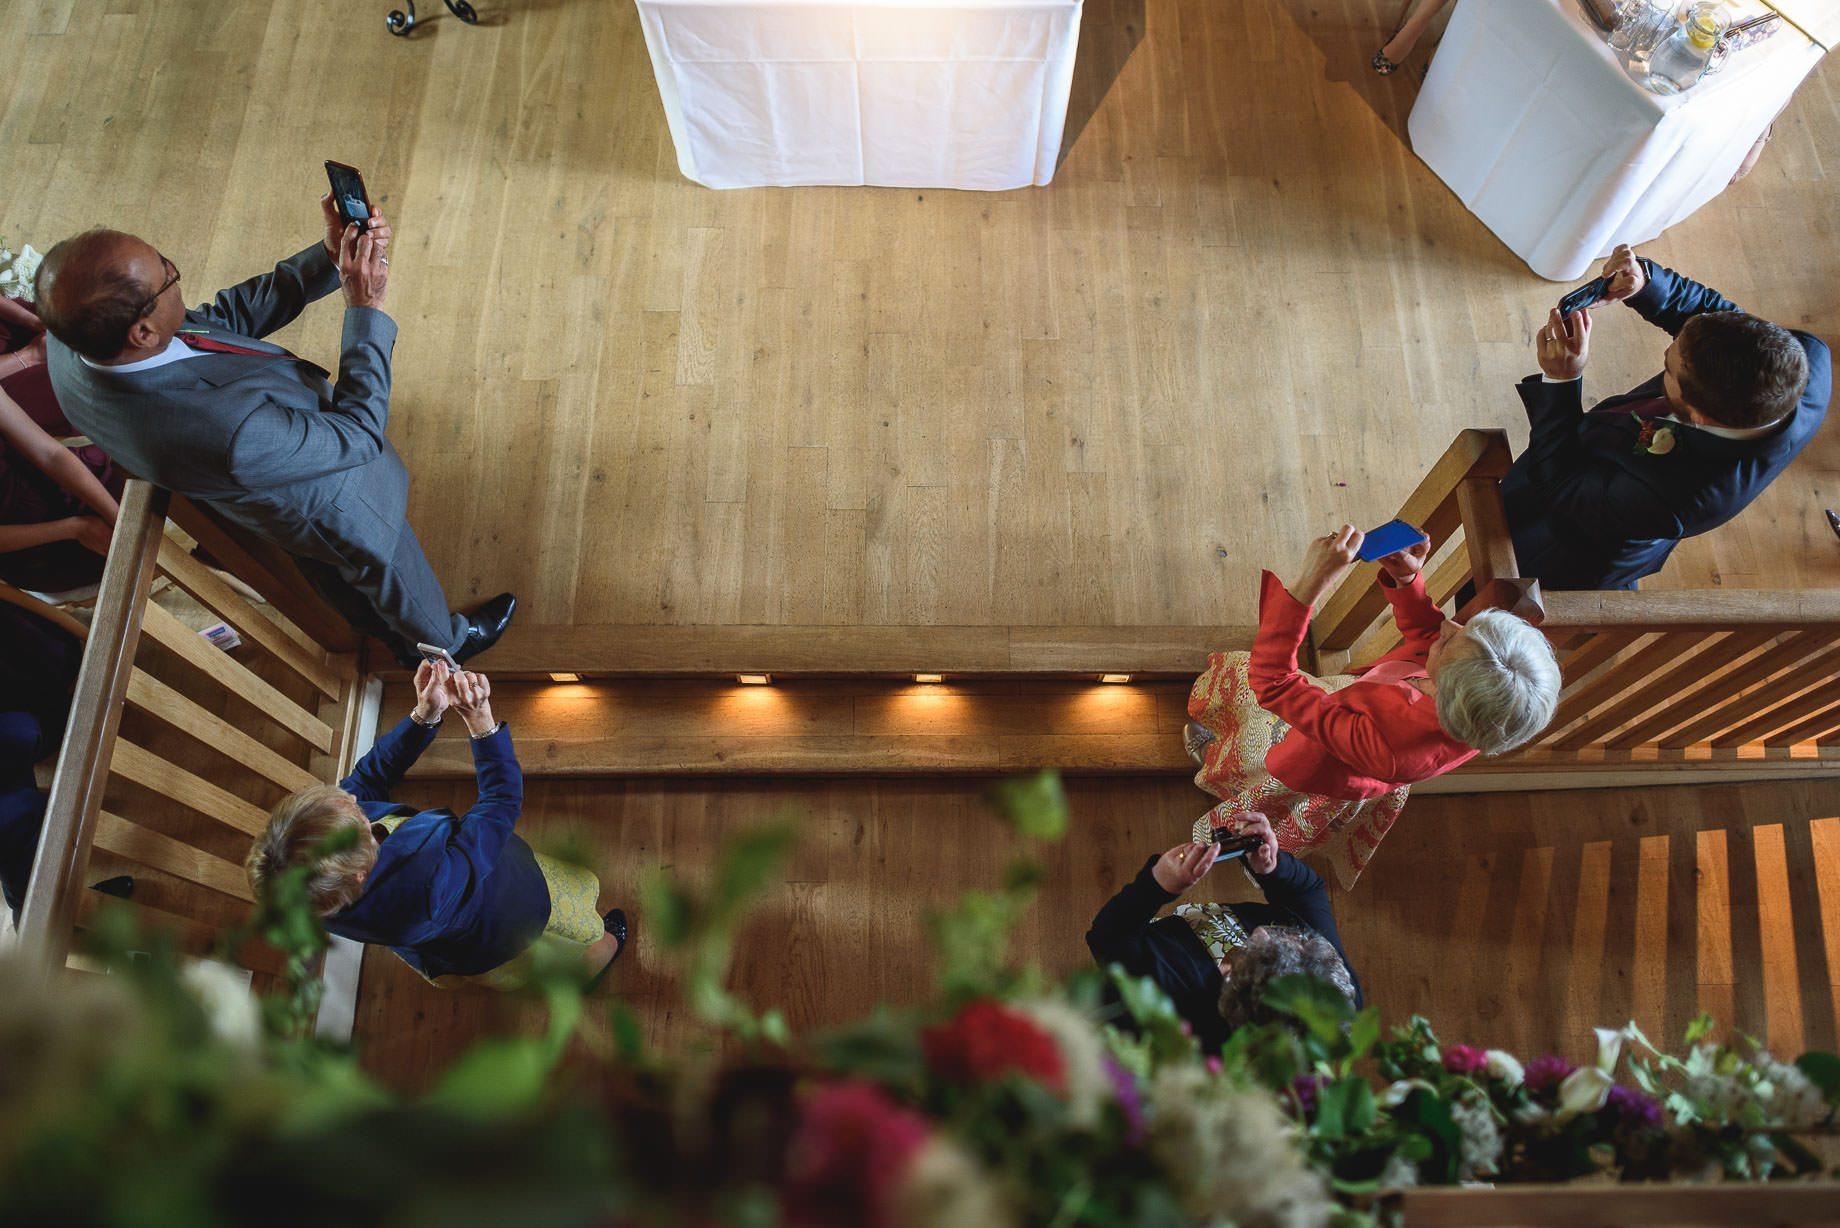 bury-court-barn-wedding-photography-guy-collier-photography-nadia-tom-64-of-184